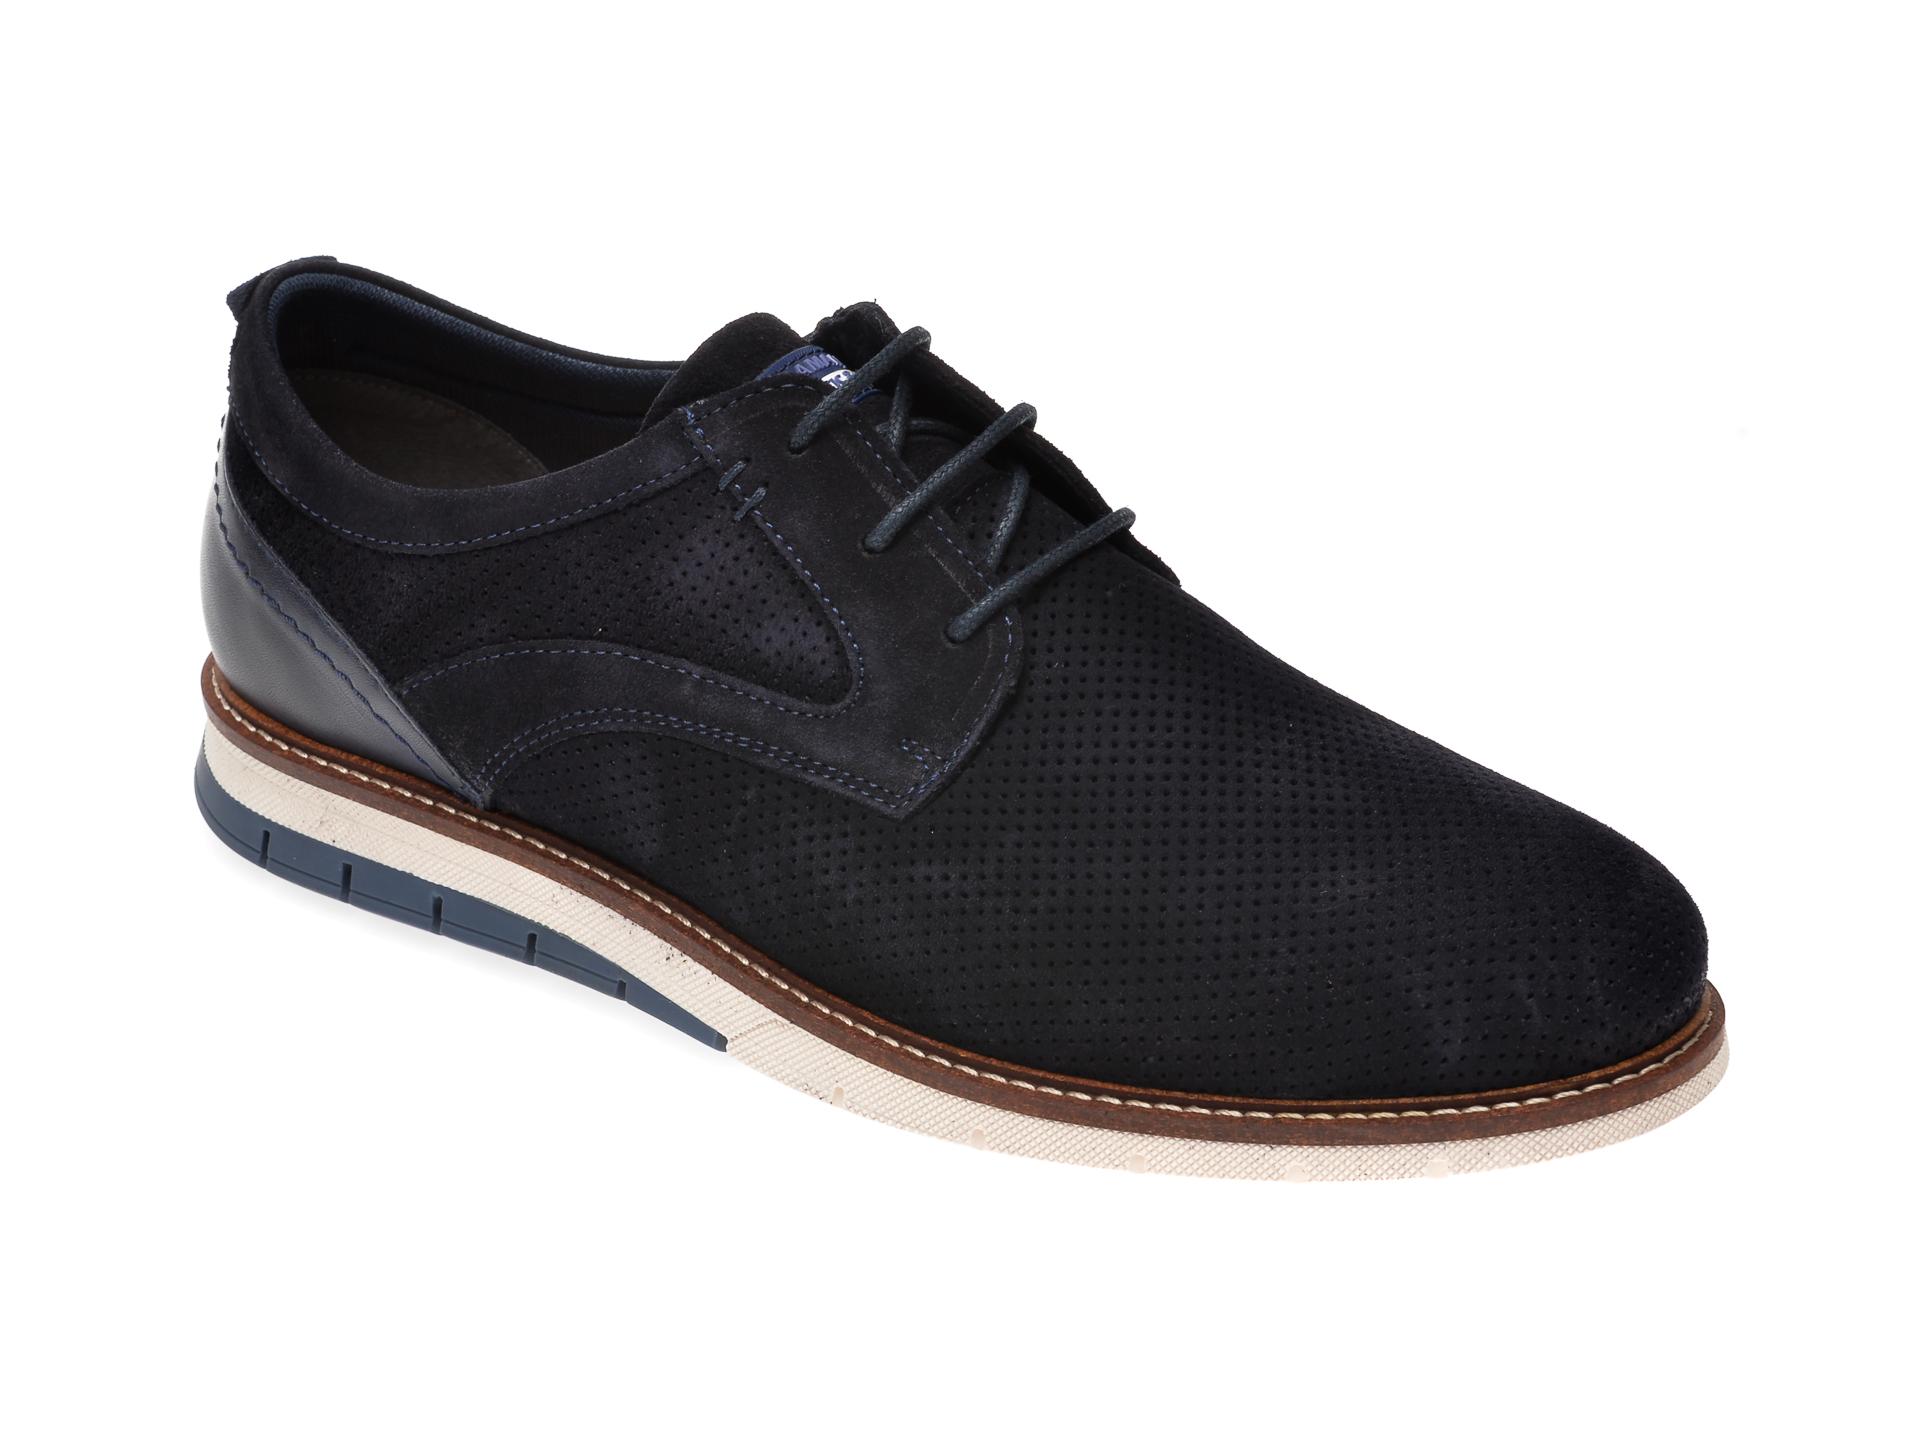 Pantofi SALAMANDER bleumarin, 56501, din piele intoarsa imagine